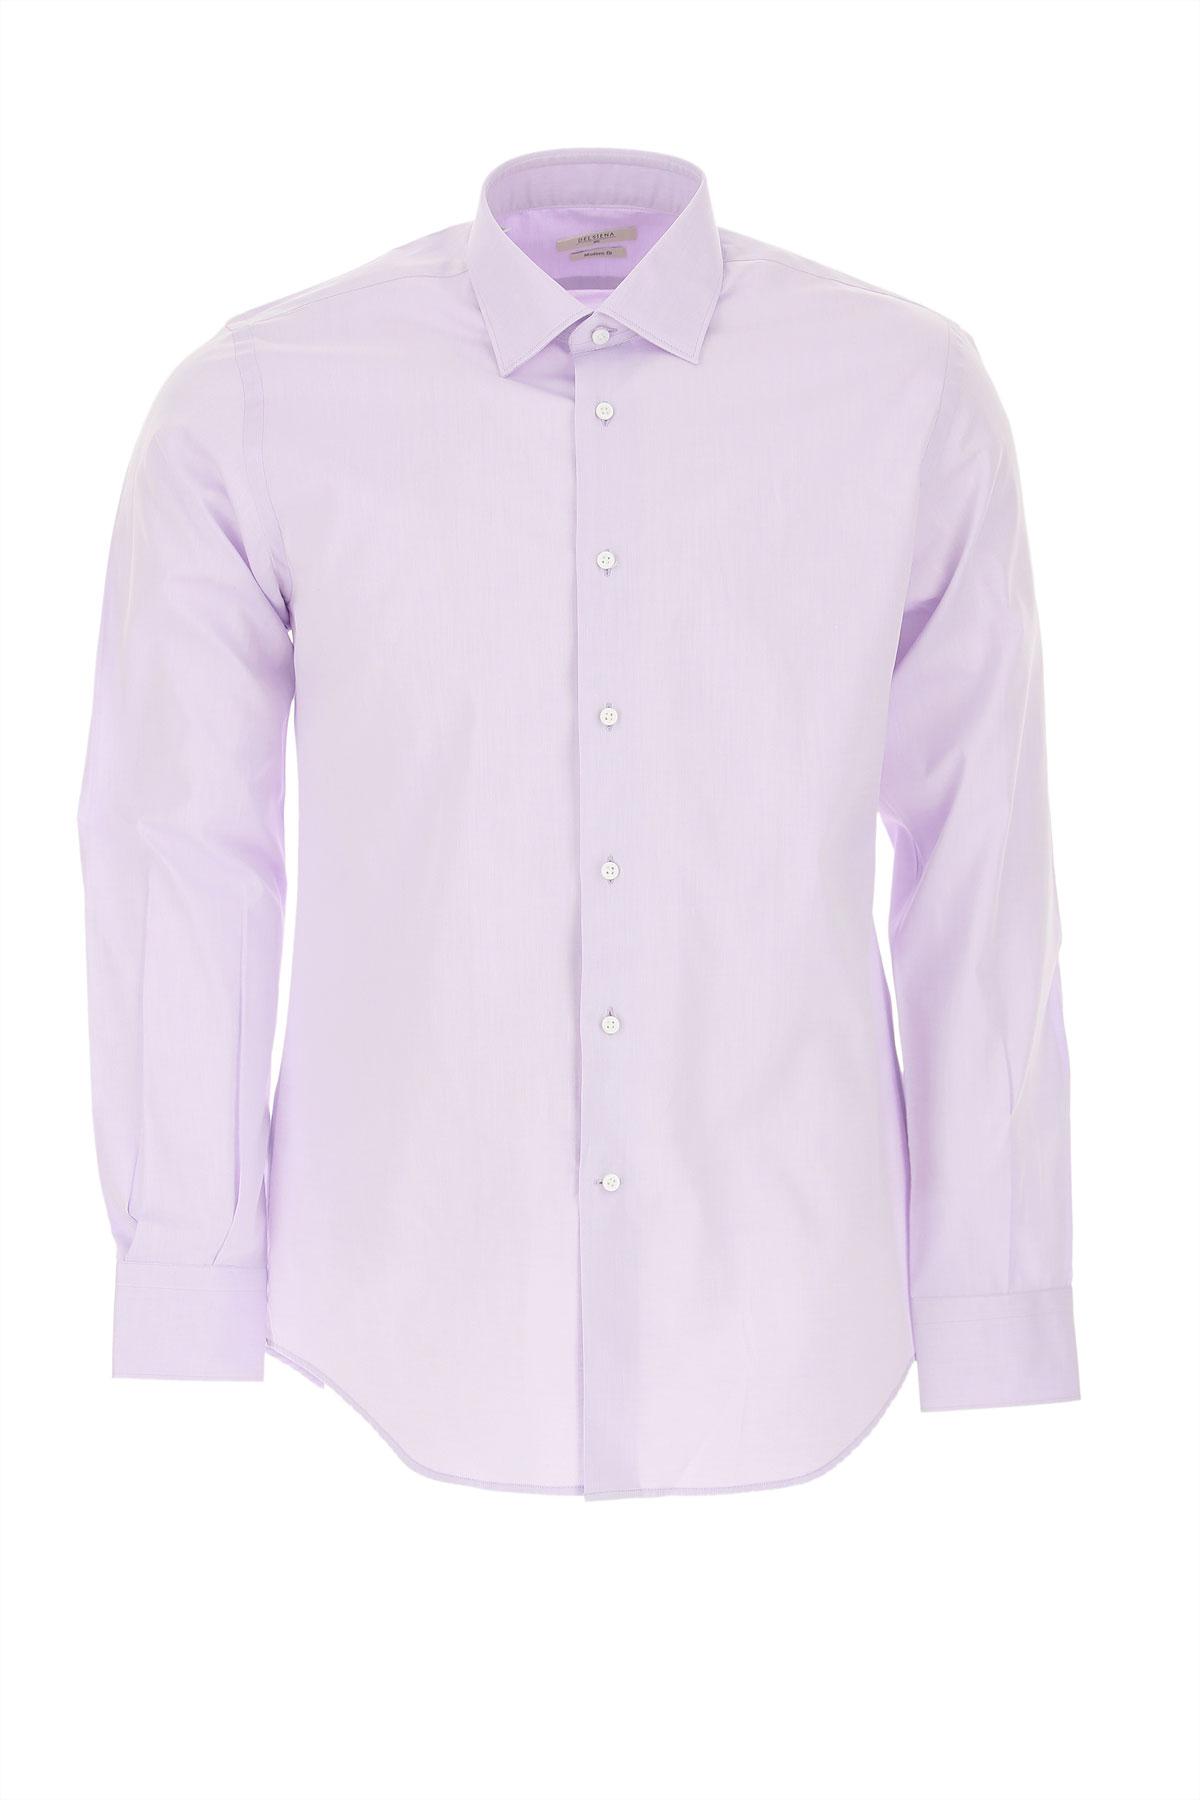 Del Siena Shirt for Men On Sale, Lilac, Cotton, 2019, 15 15.5 15.75 16 16.5 17 17.5